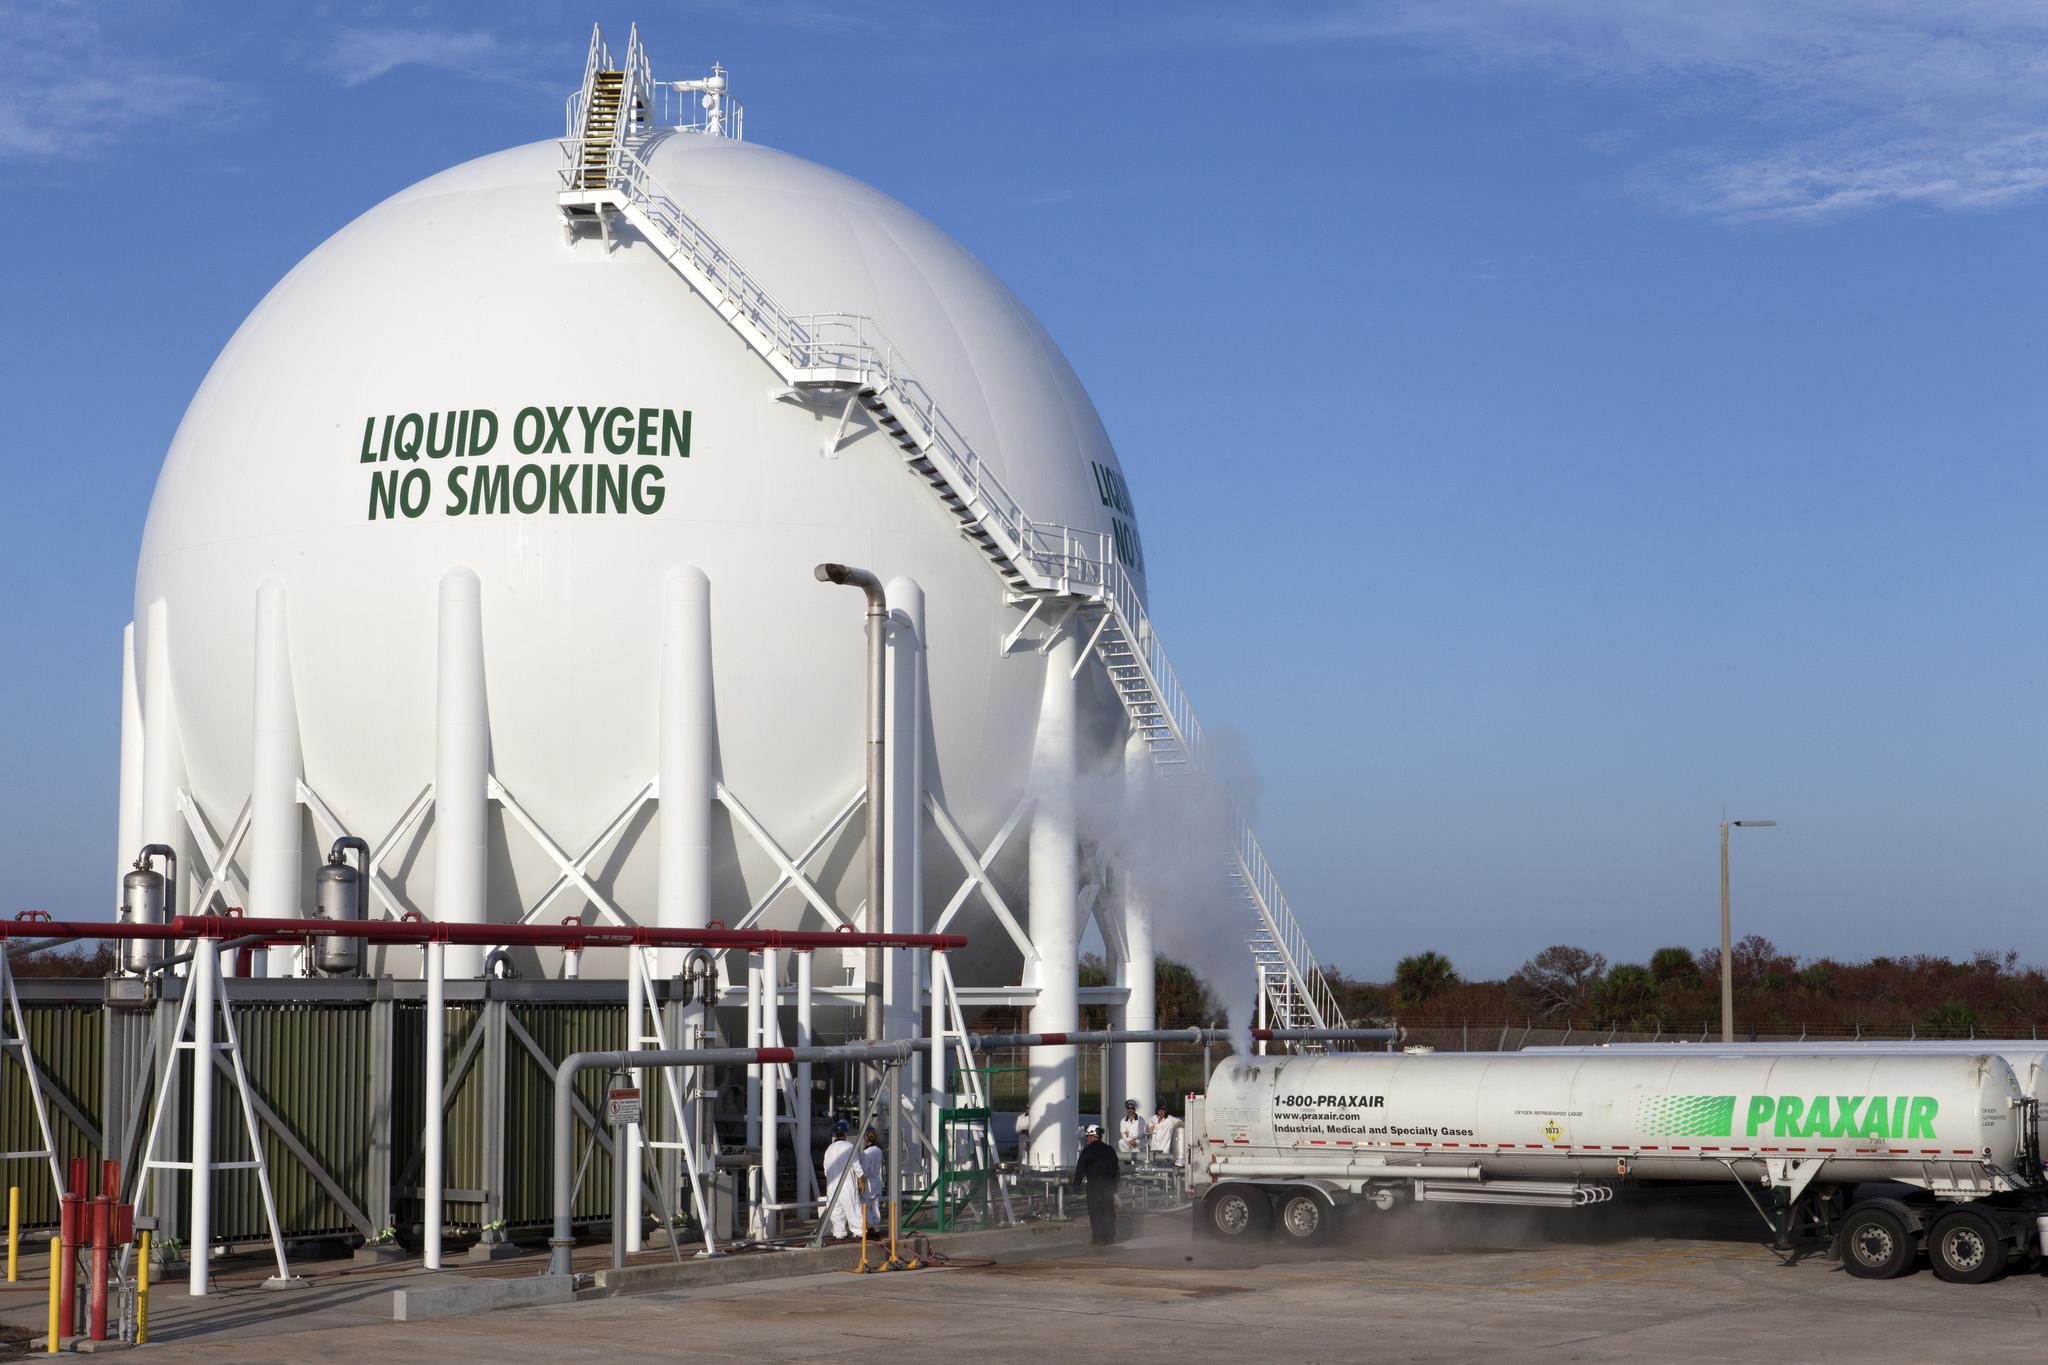 Liquid Oxygen Tanking Operations Begin at Launch Pad 39B